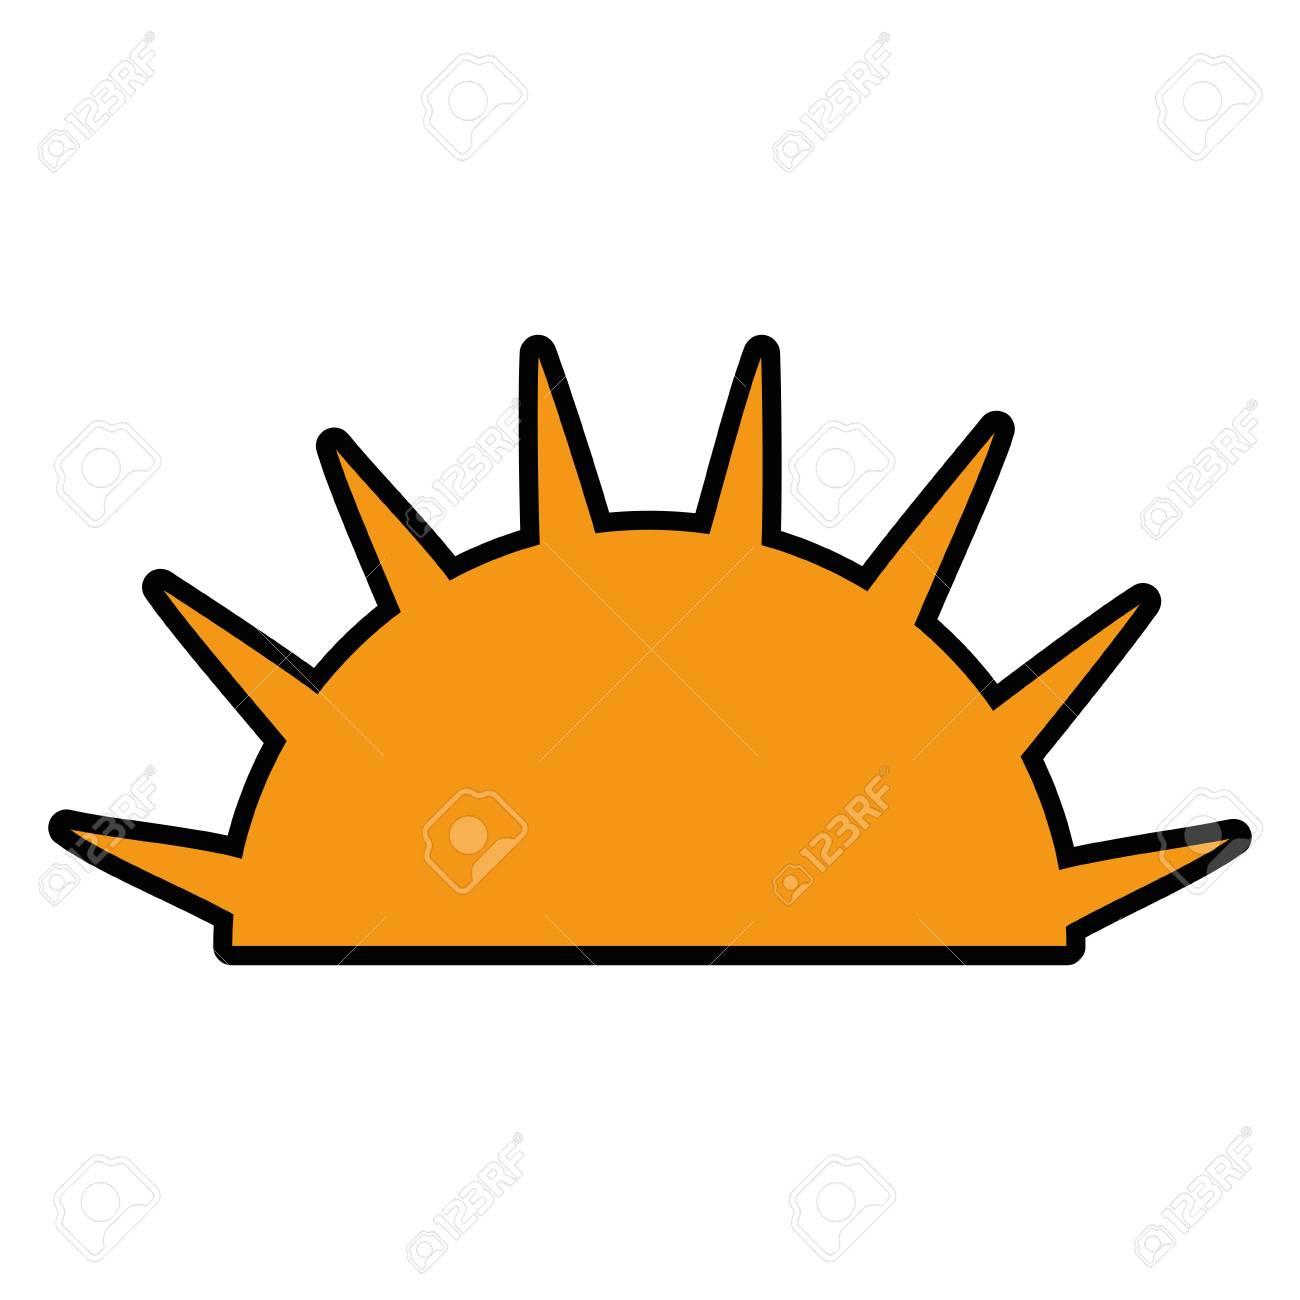 Isolated Half Sun Icon Vector Illustration Graphic Design Royalty